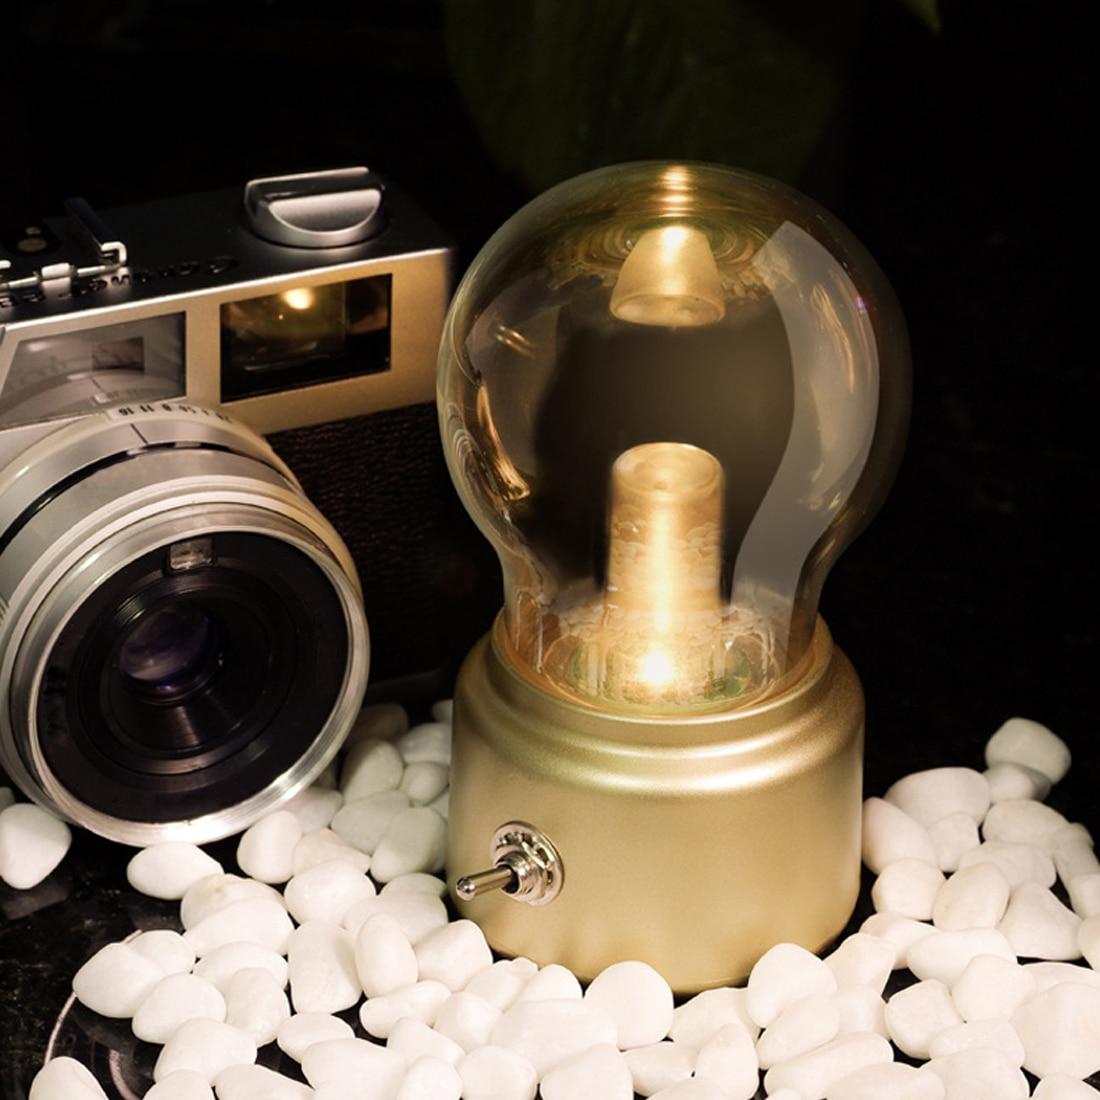 1pc Intage Bulb Night Light Retro USB Lamp Rechargeable Luminaria Nightlight Luces LED Energy-saving Book Lights Mini Bed Lamps